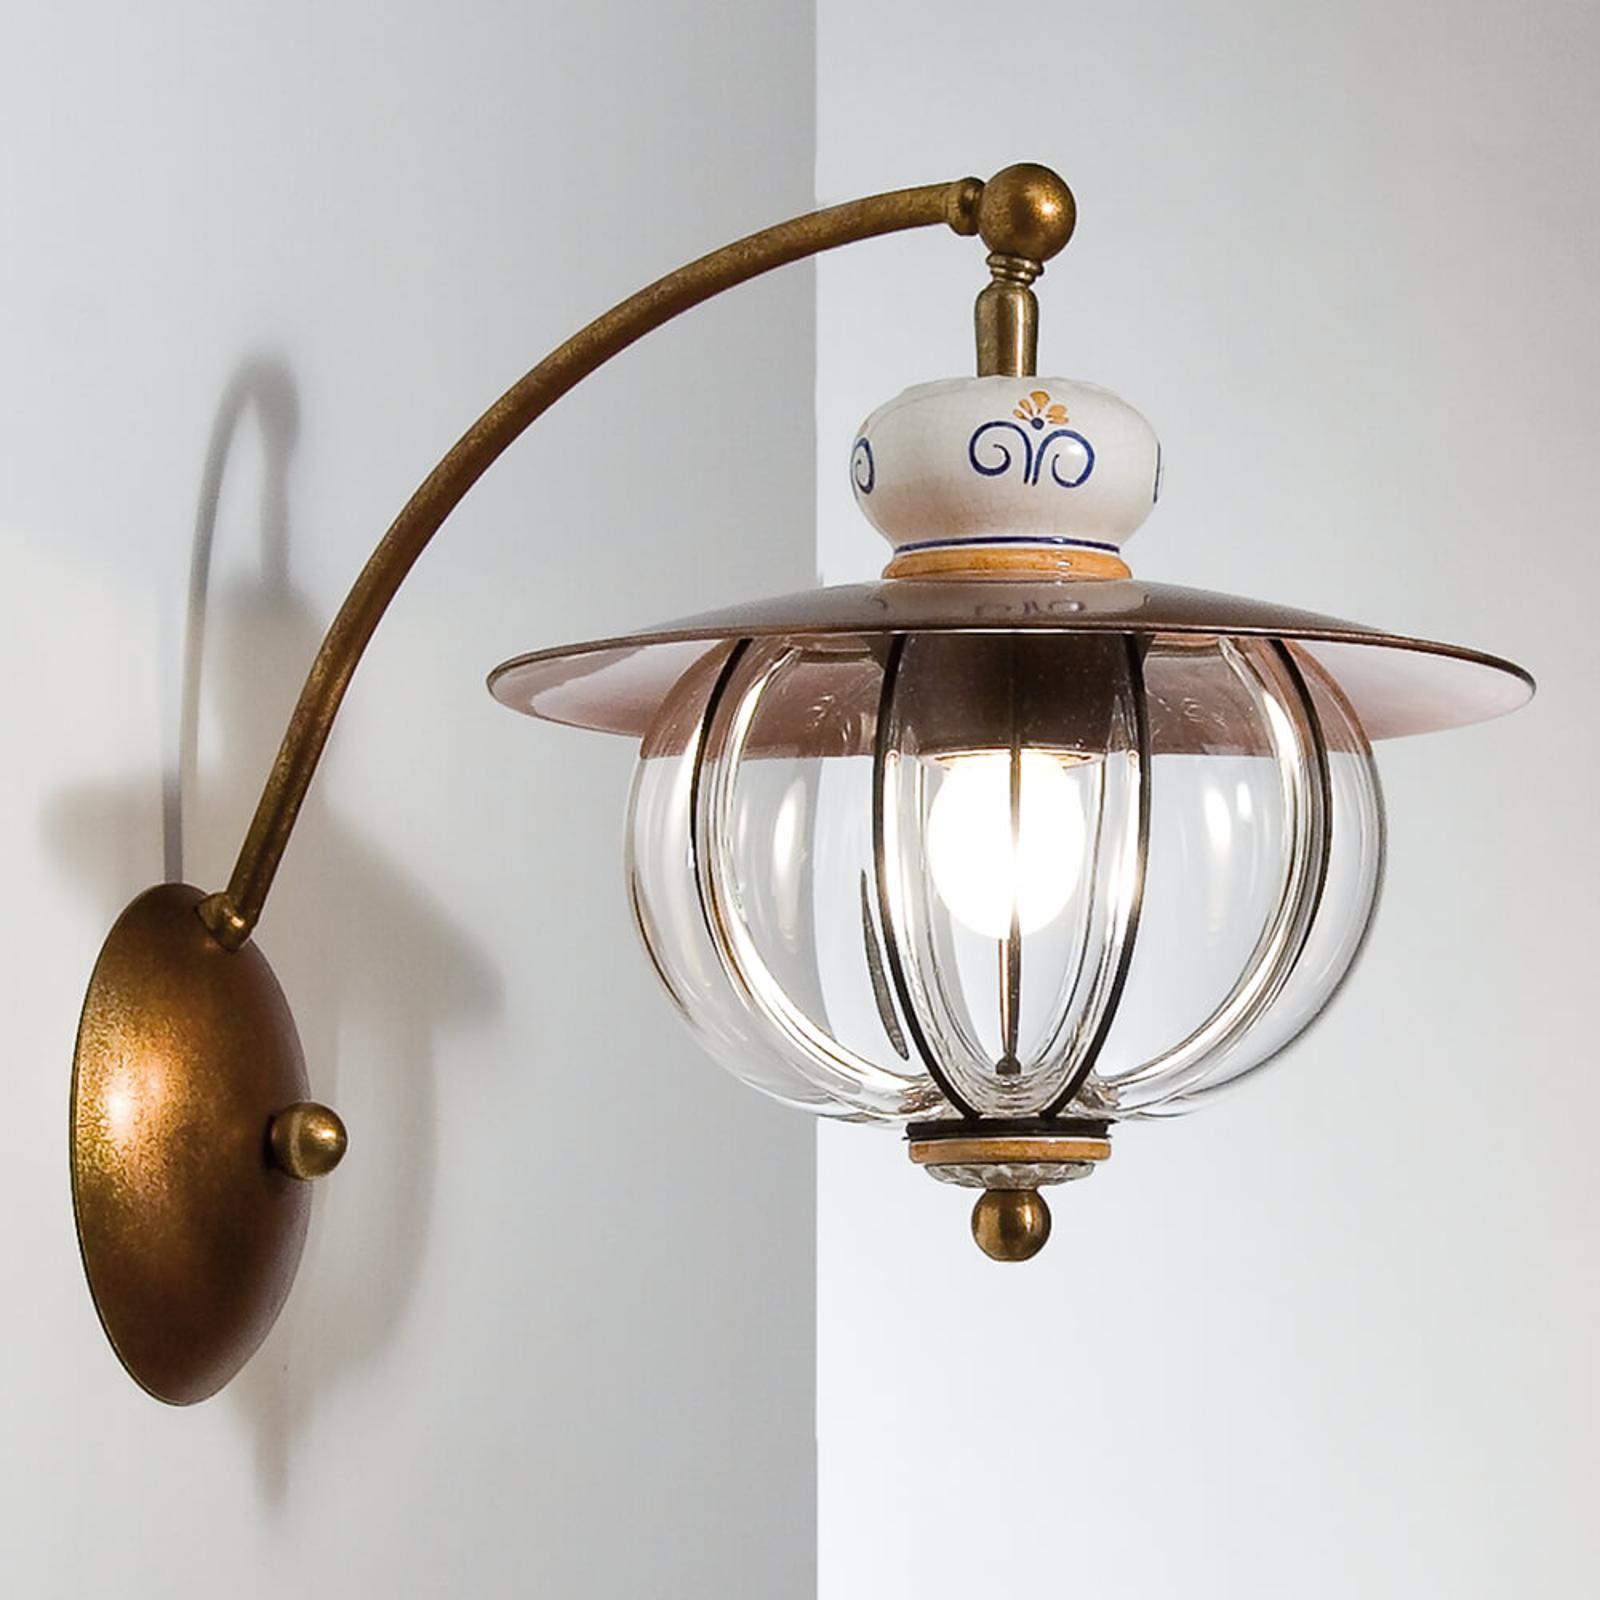 Uitnodigende wandlamp Lampara - hangemaakt